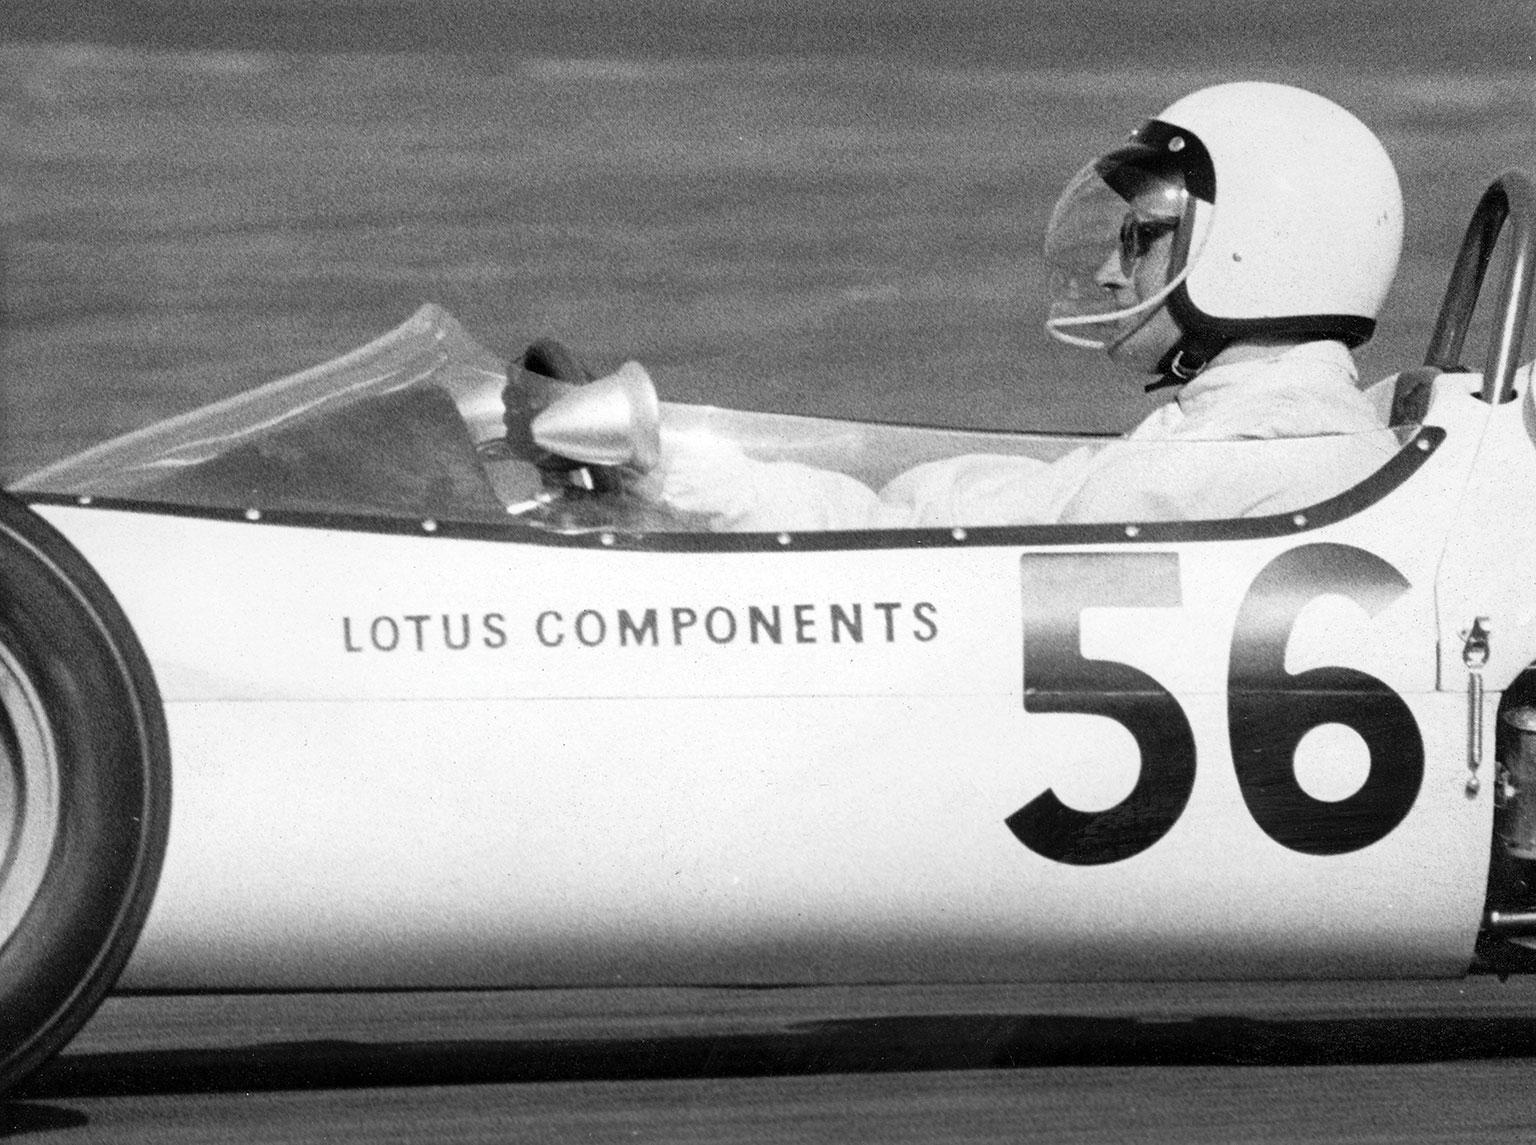 1967JohnMilesLotusComponentsF3LAT